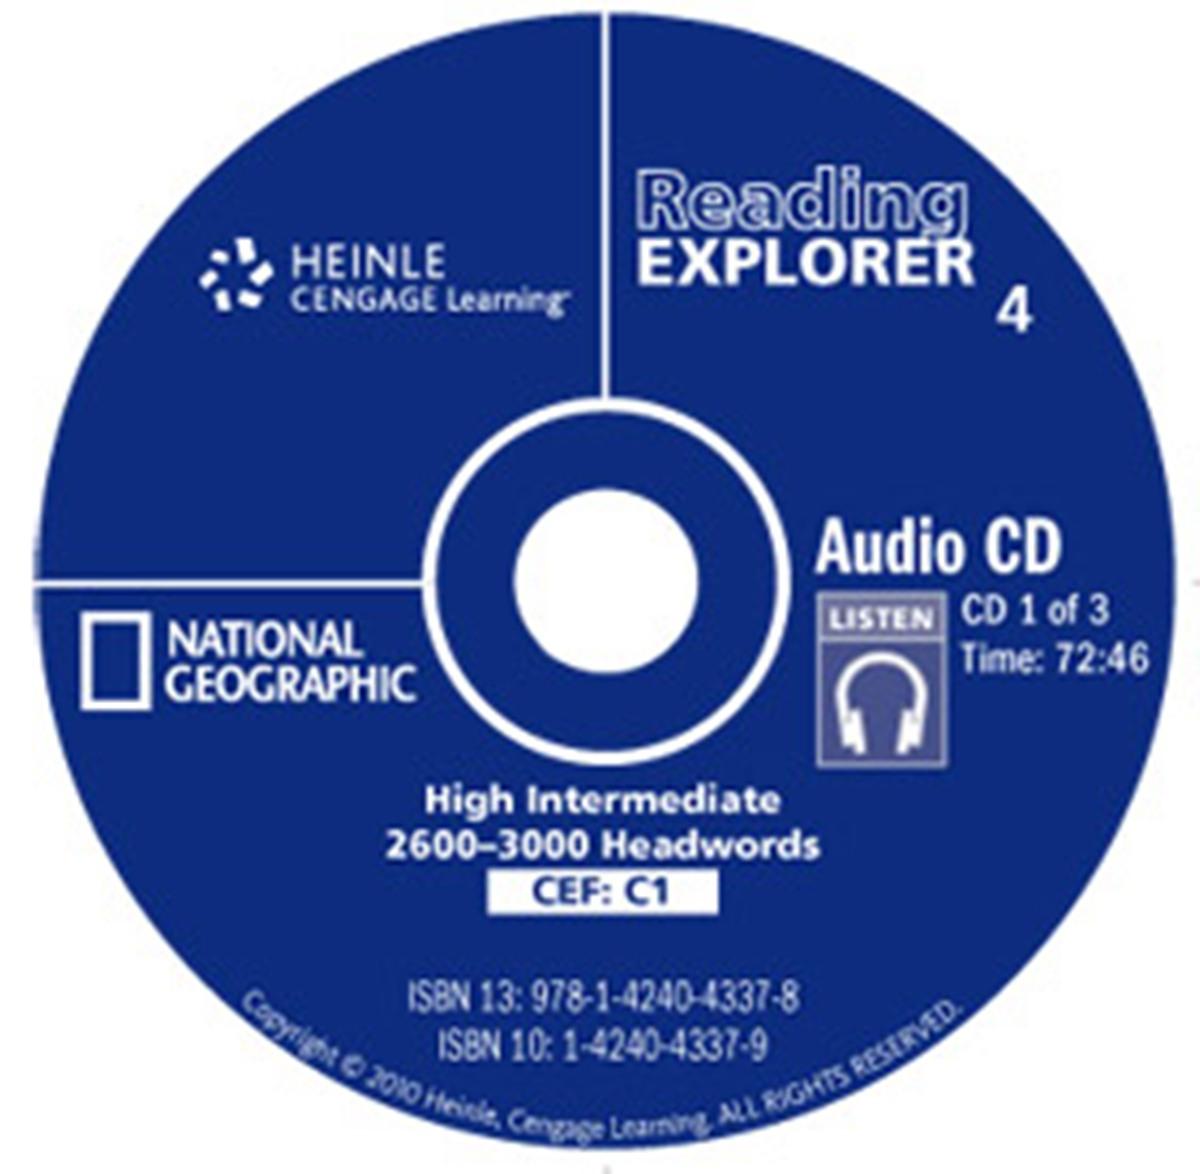 Reading Explorer 4 Audio CD(x1)